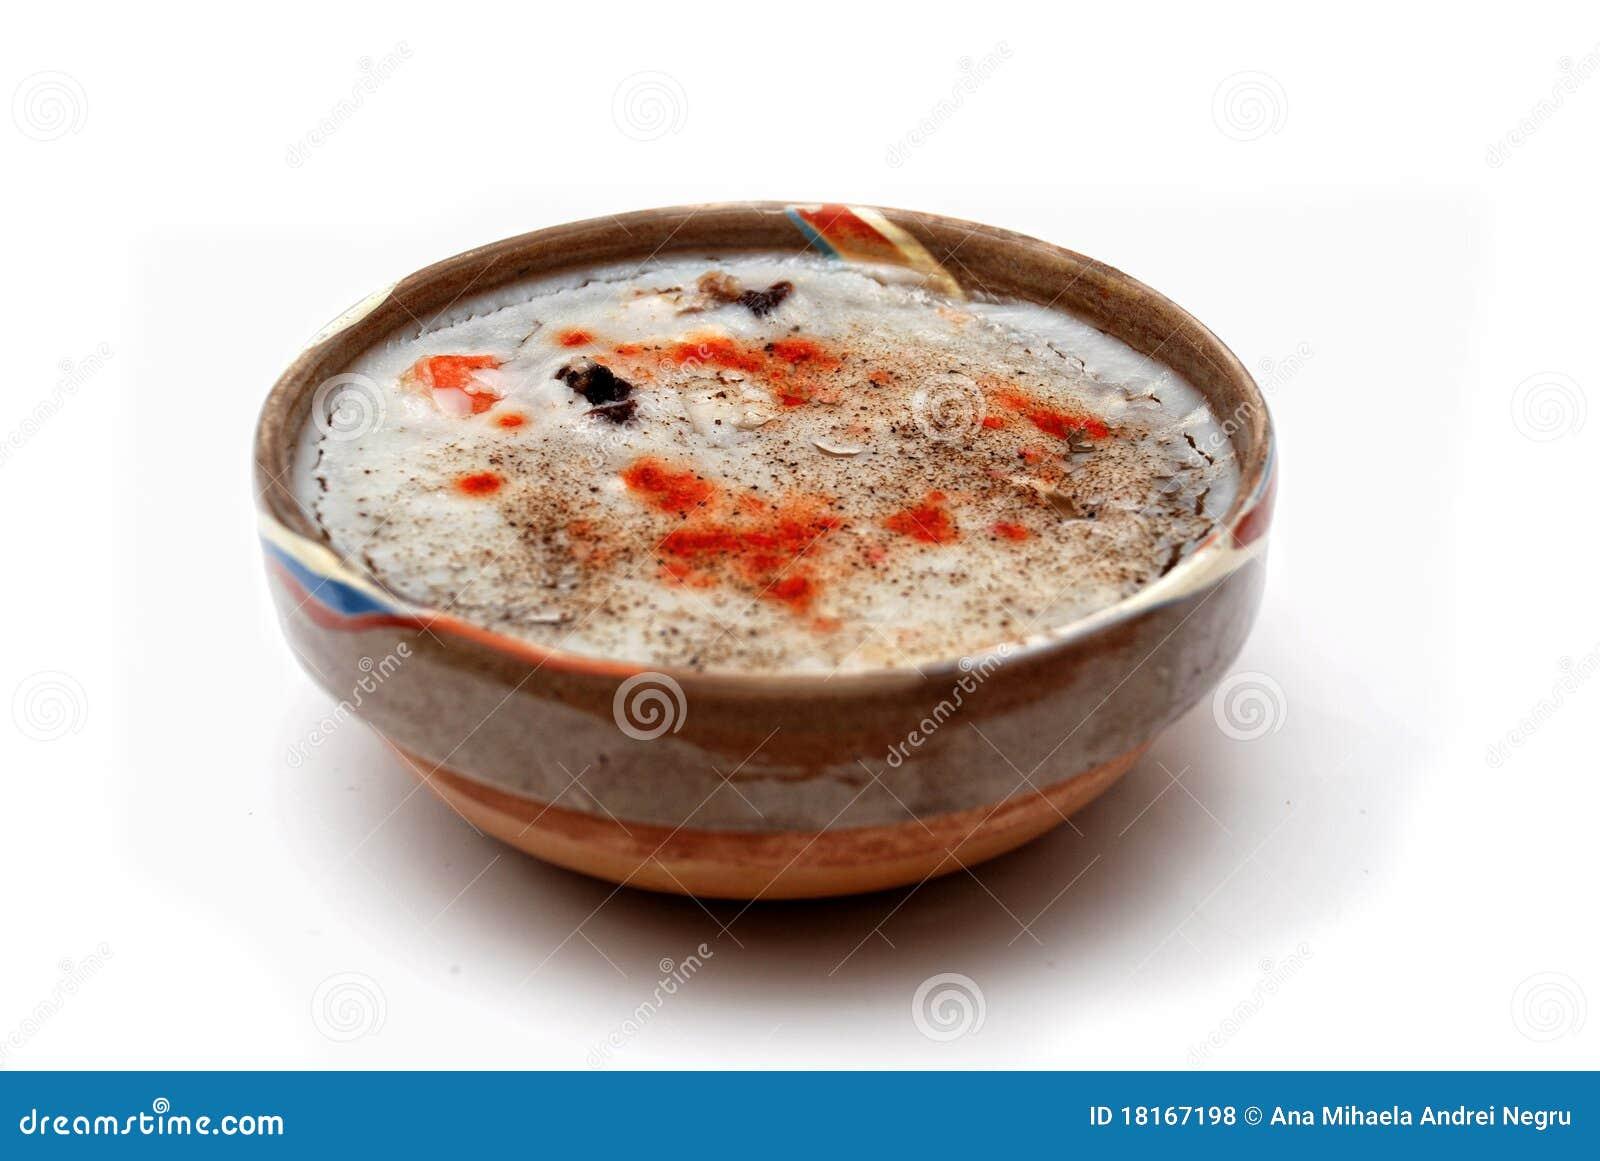 Alimento romeno tradicional nomeado piftie